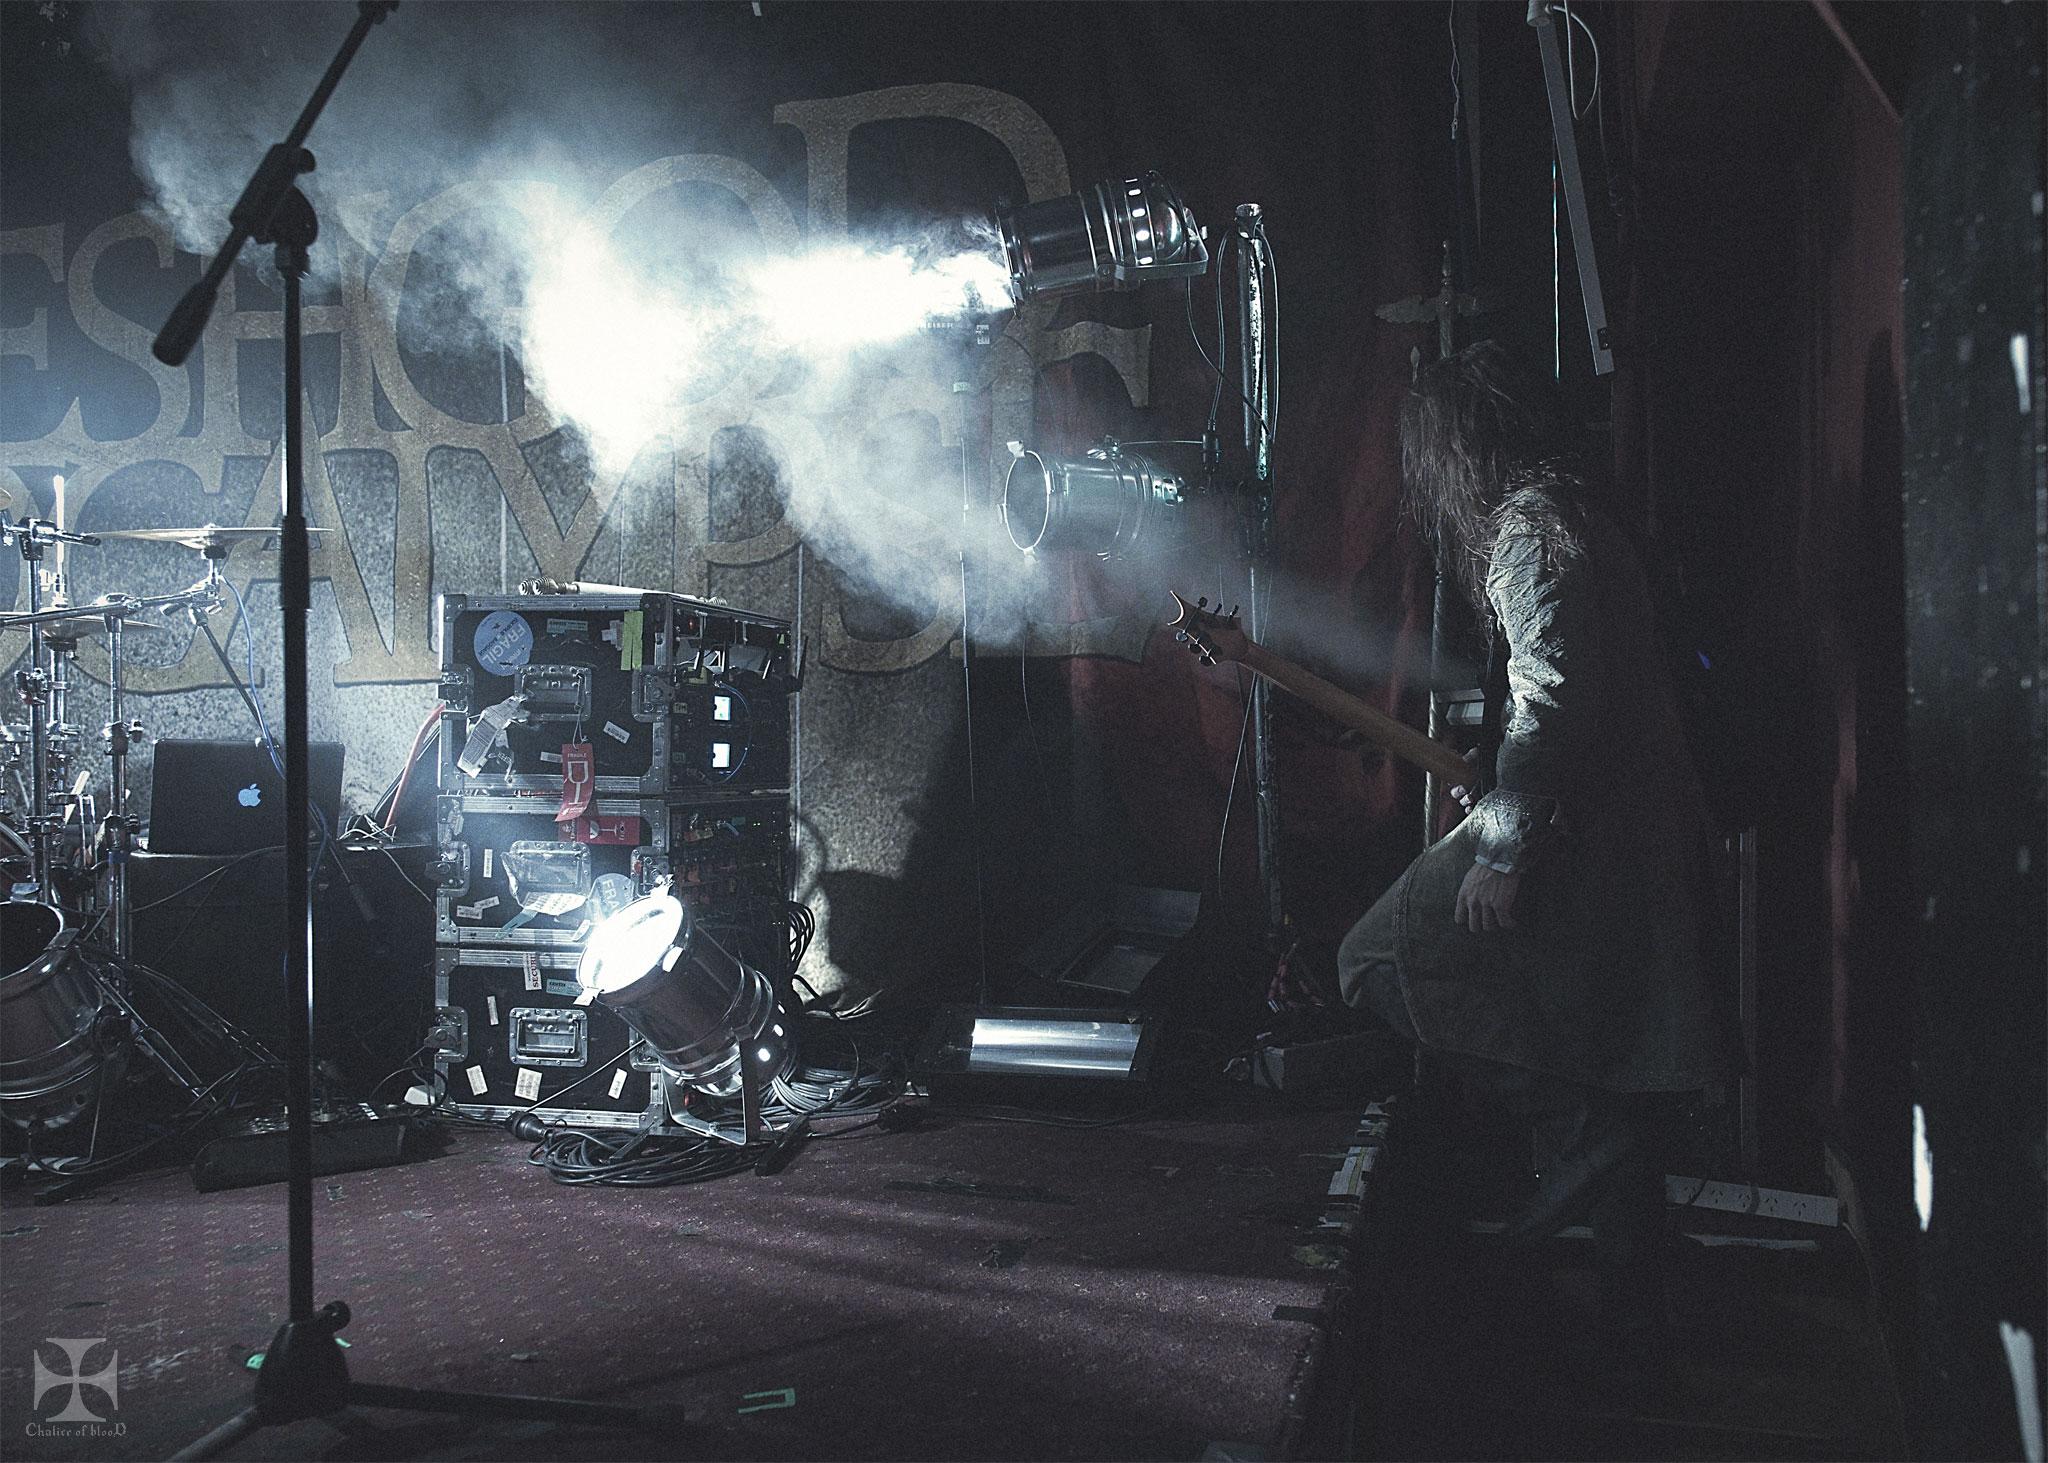 Fleshgod-Apocalypse-0693-Exposure-watermarked.jpg